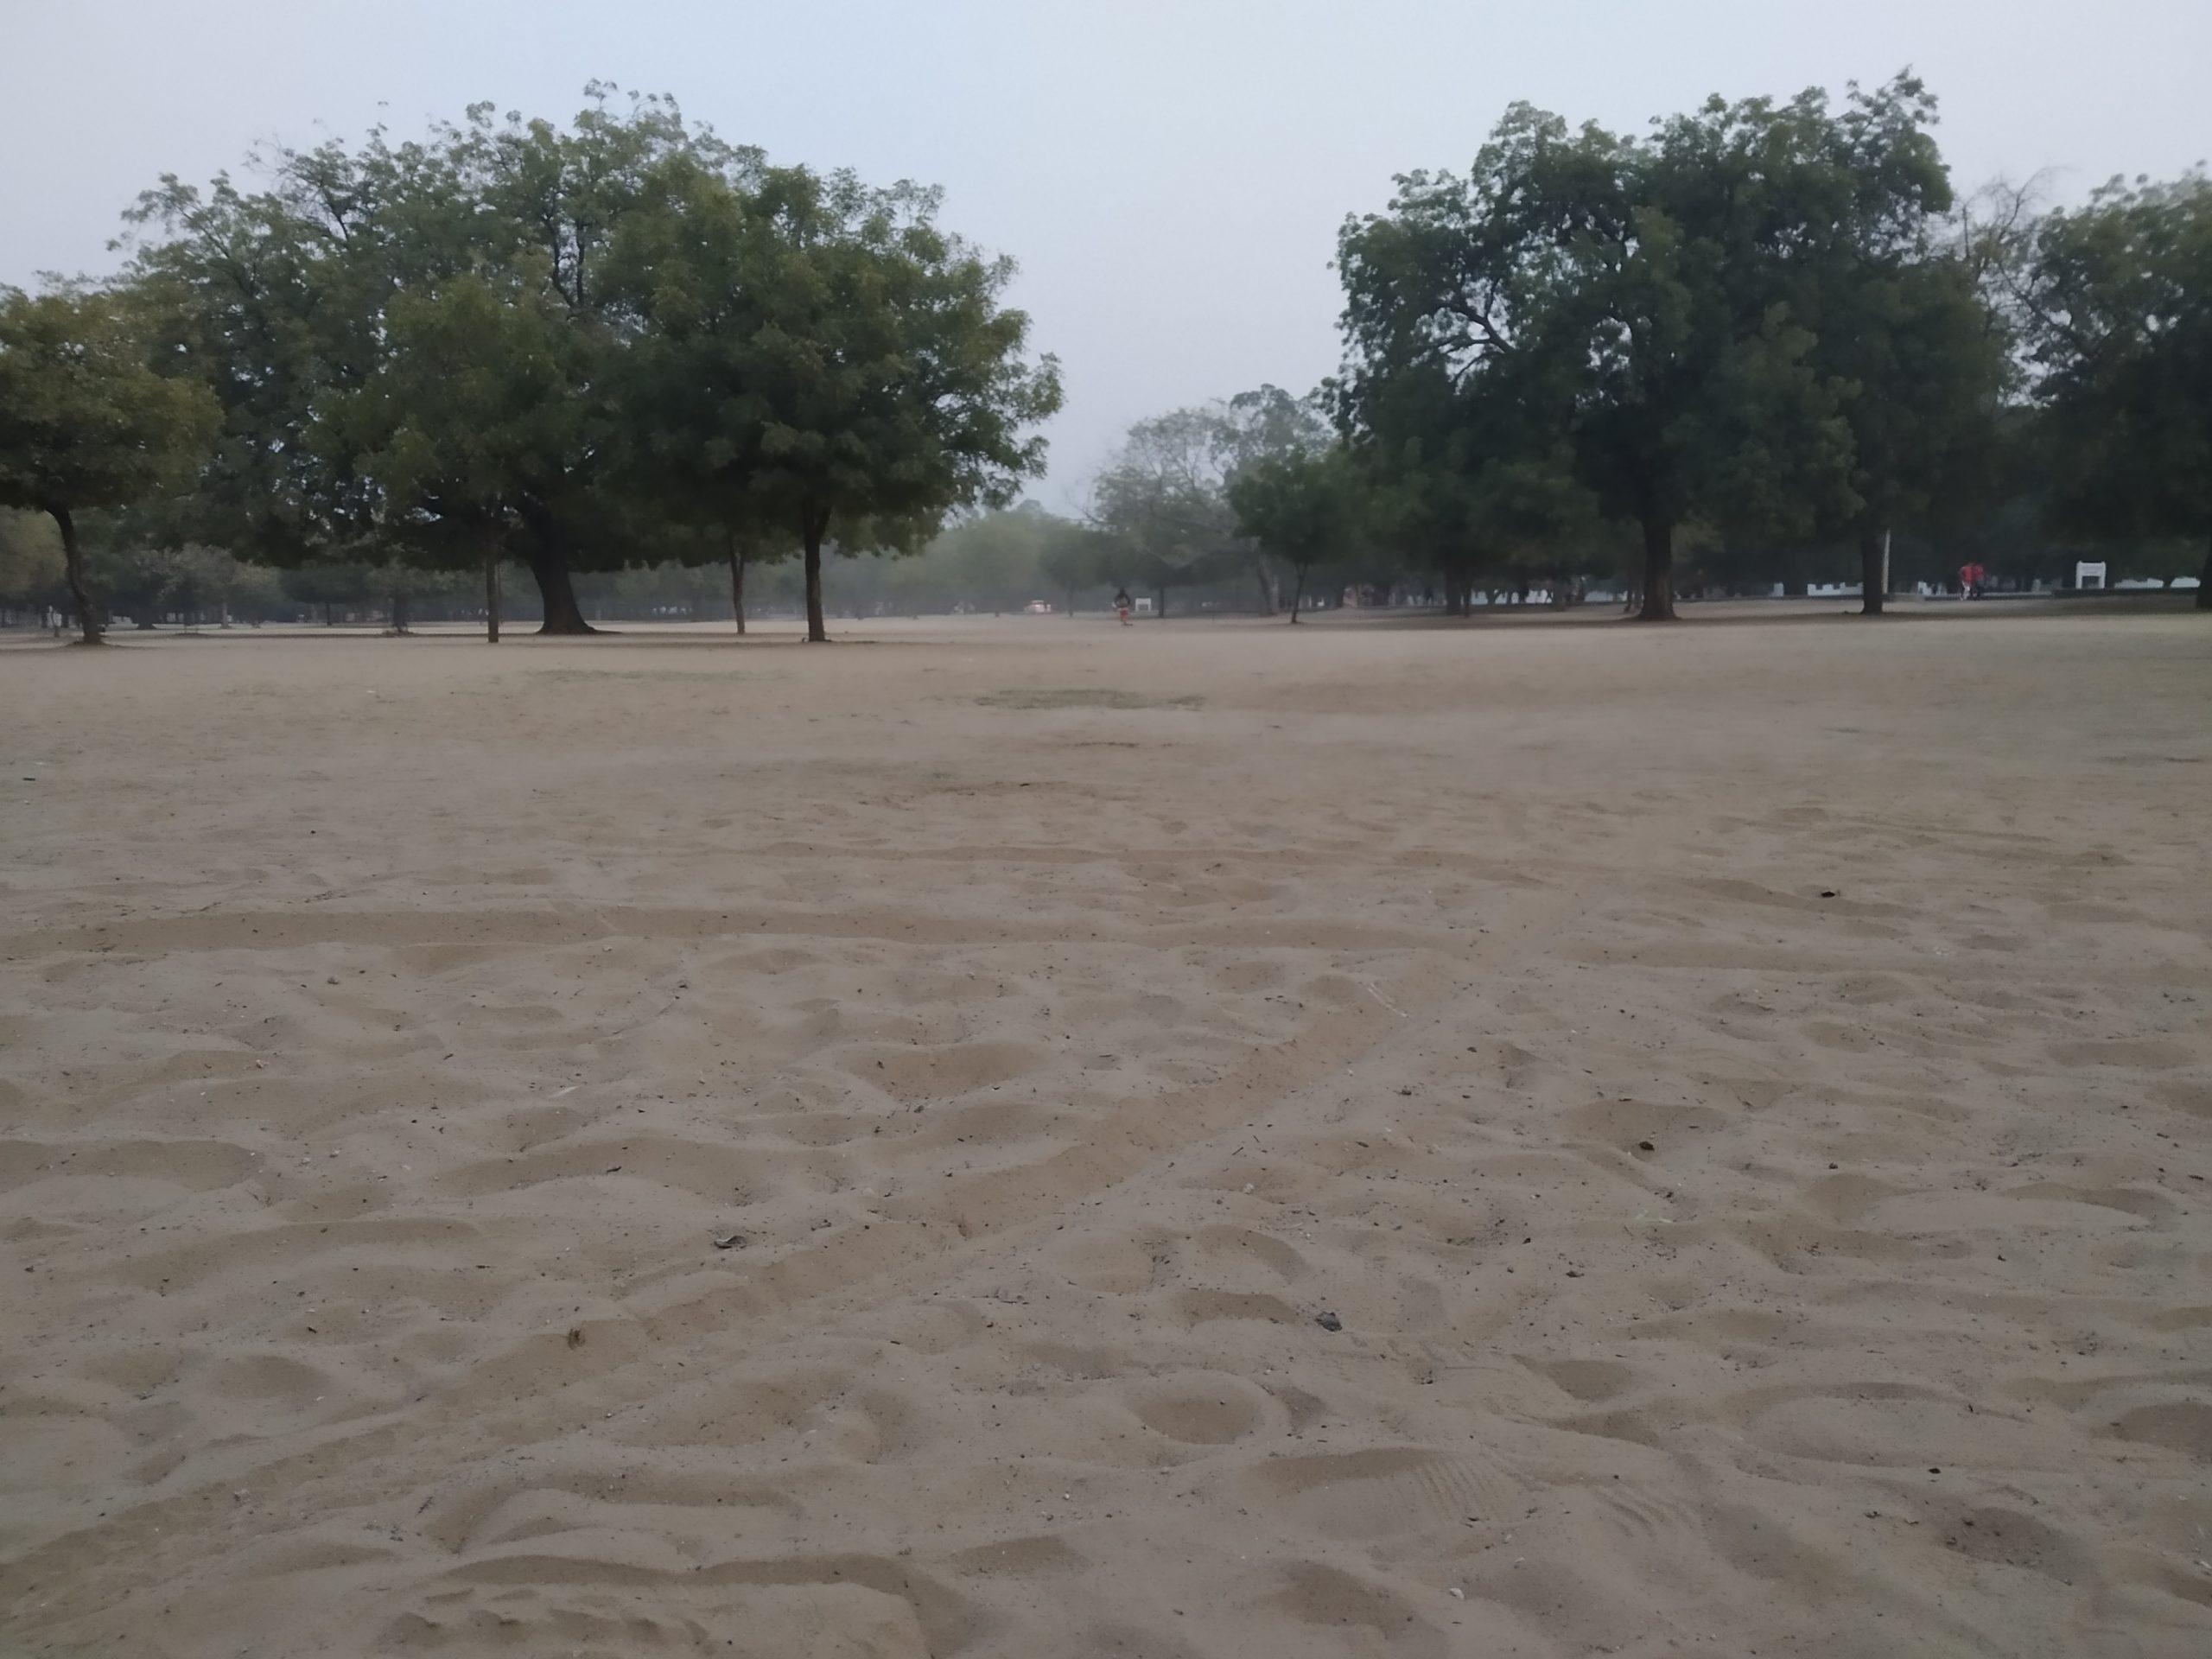 Sand Dunes Formation